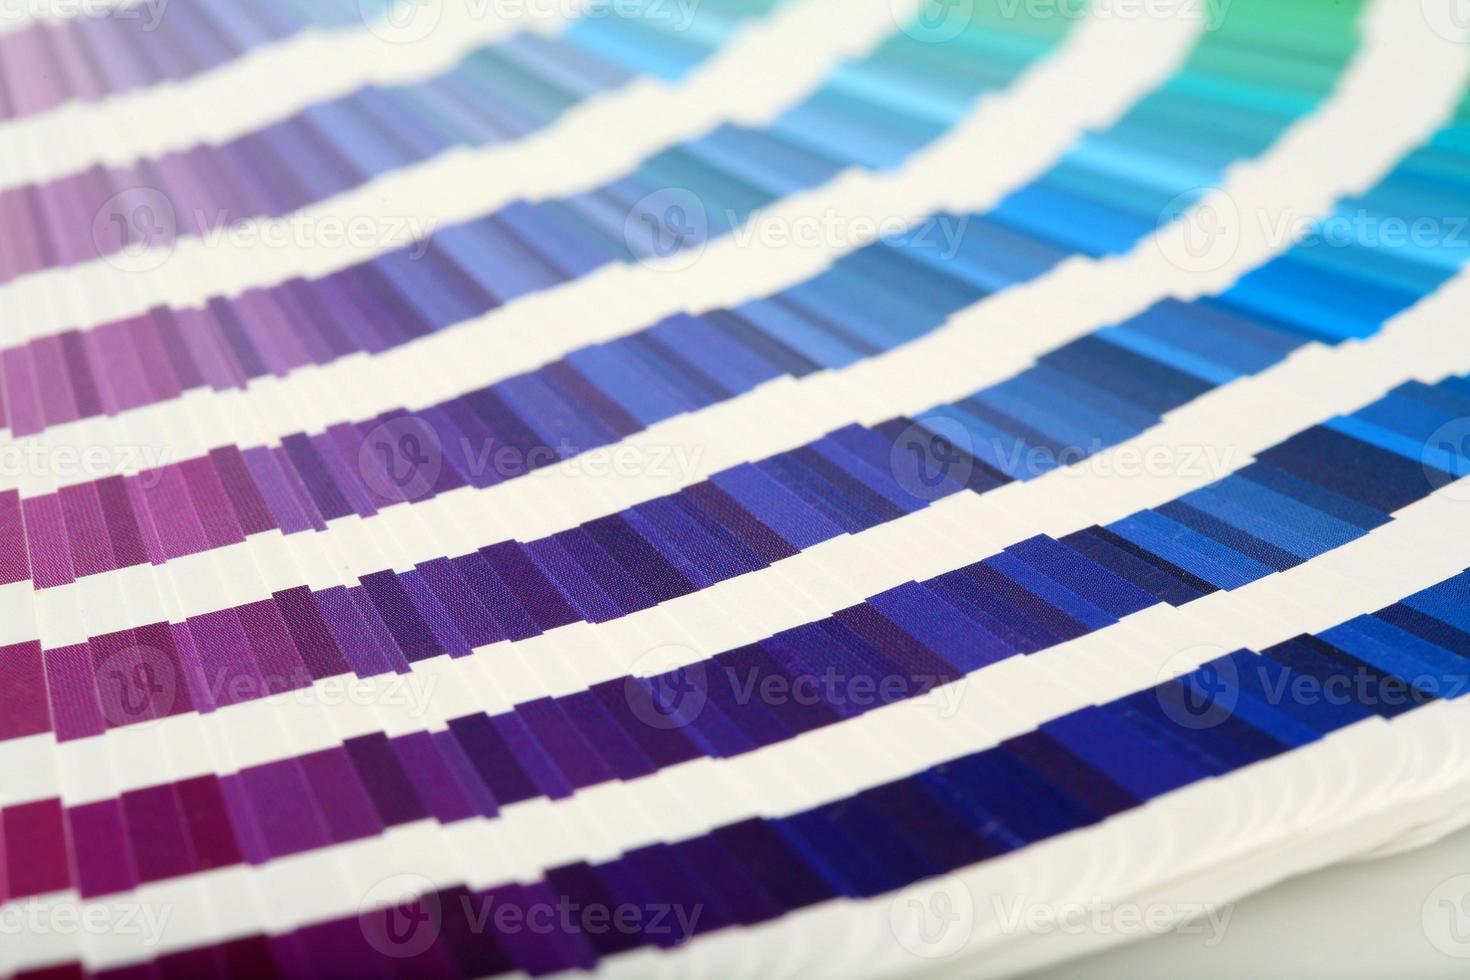 Musterbuch lila-> grün foto